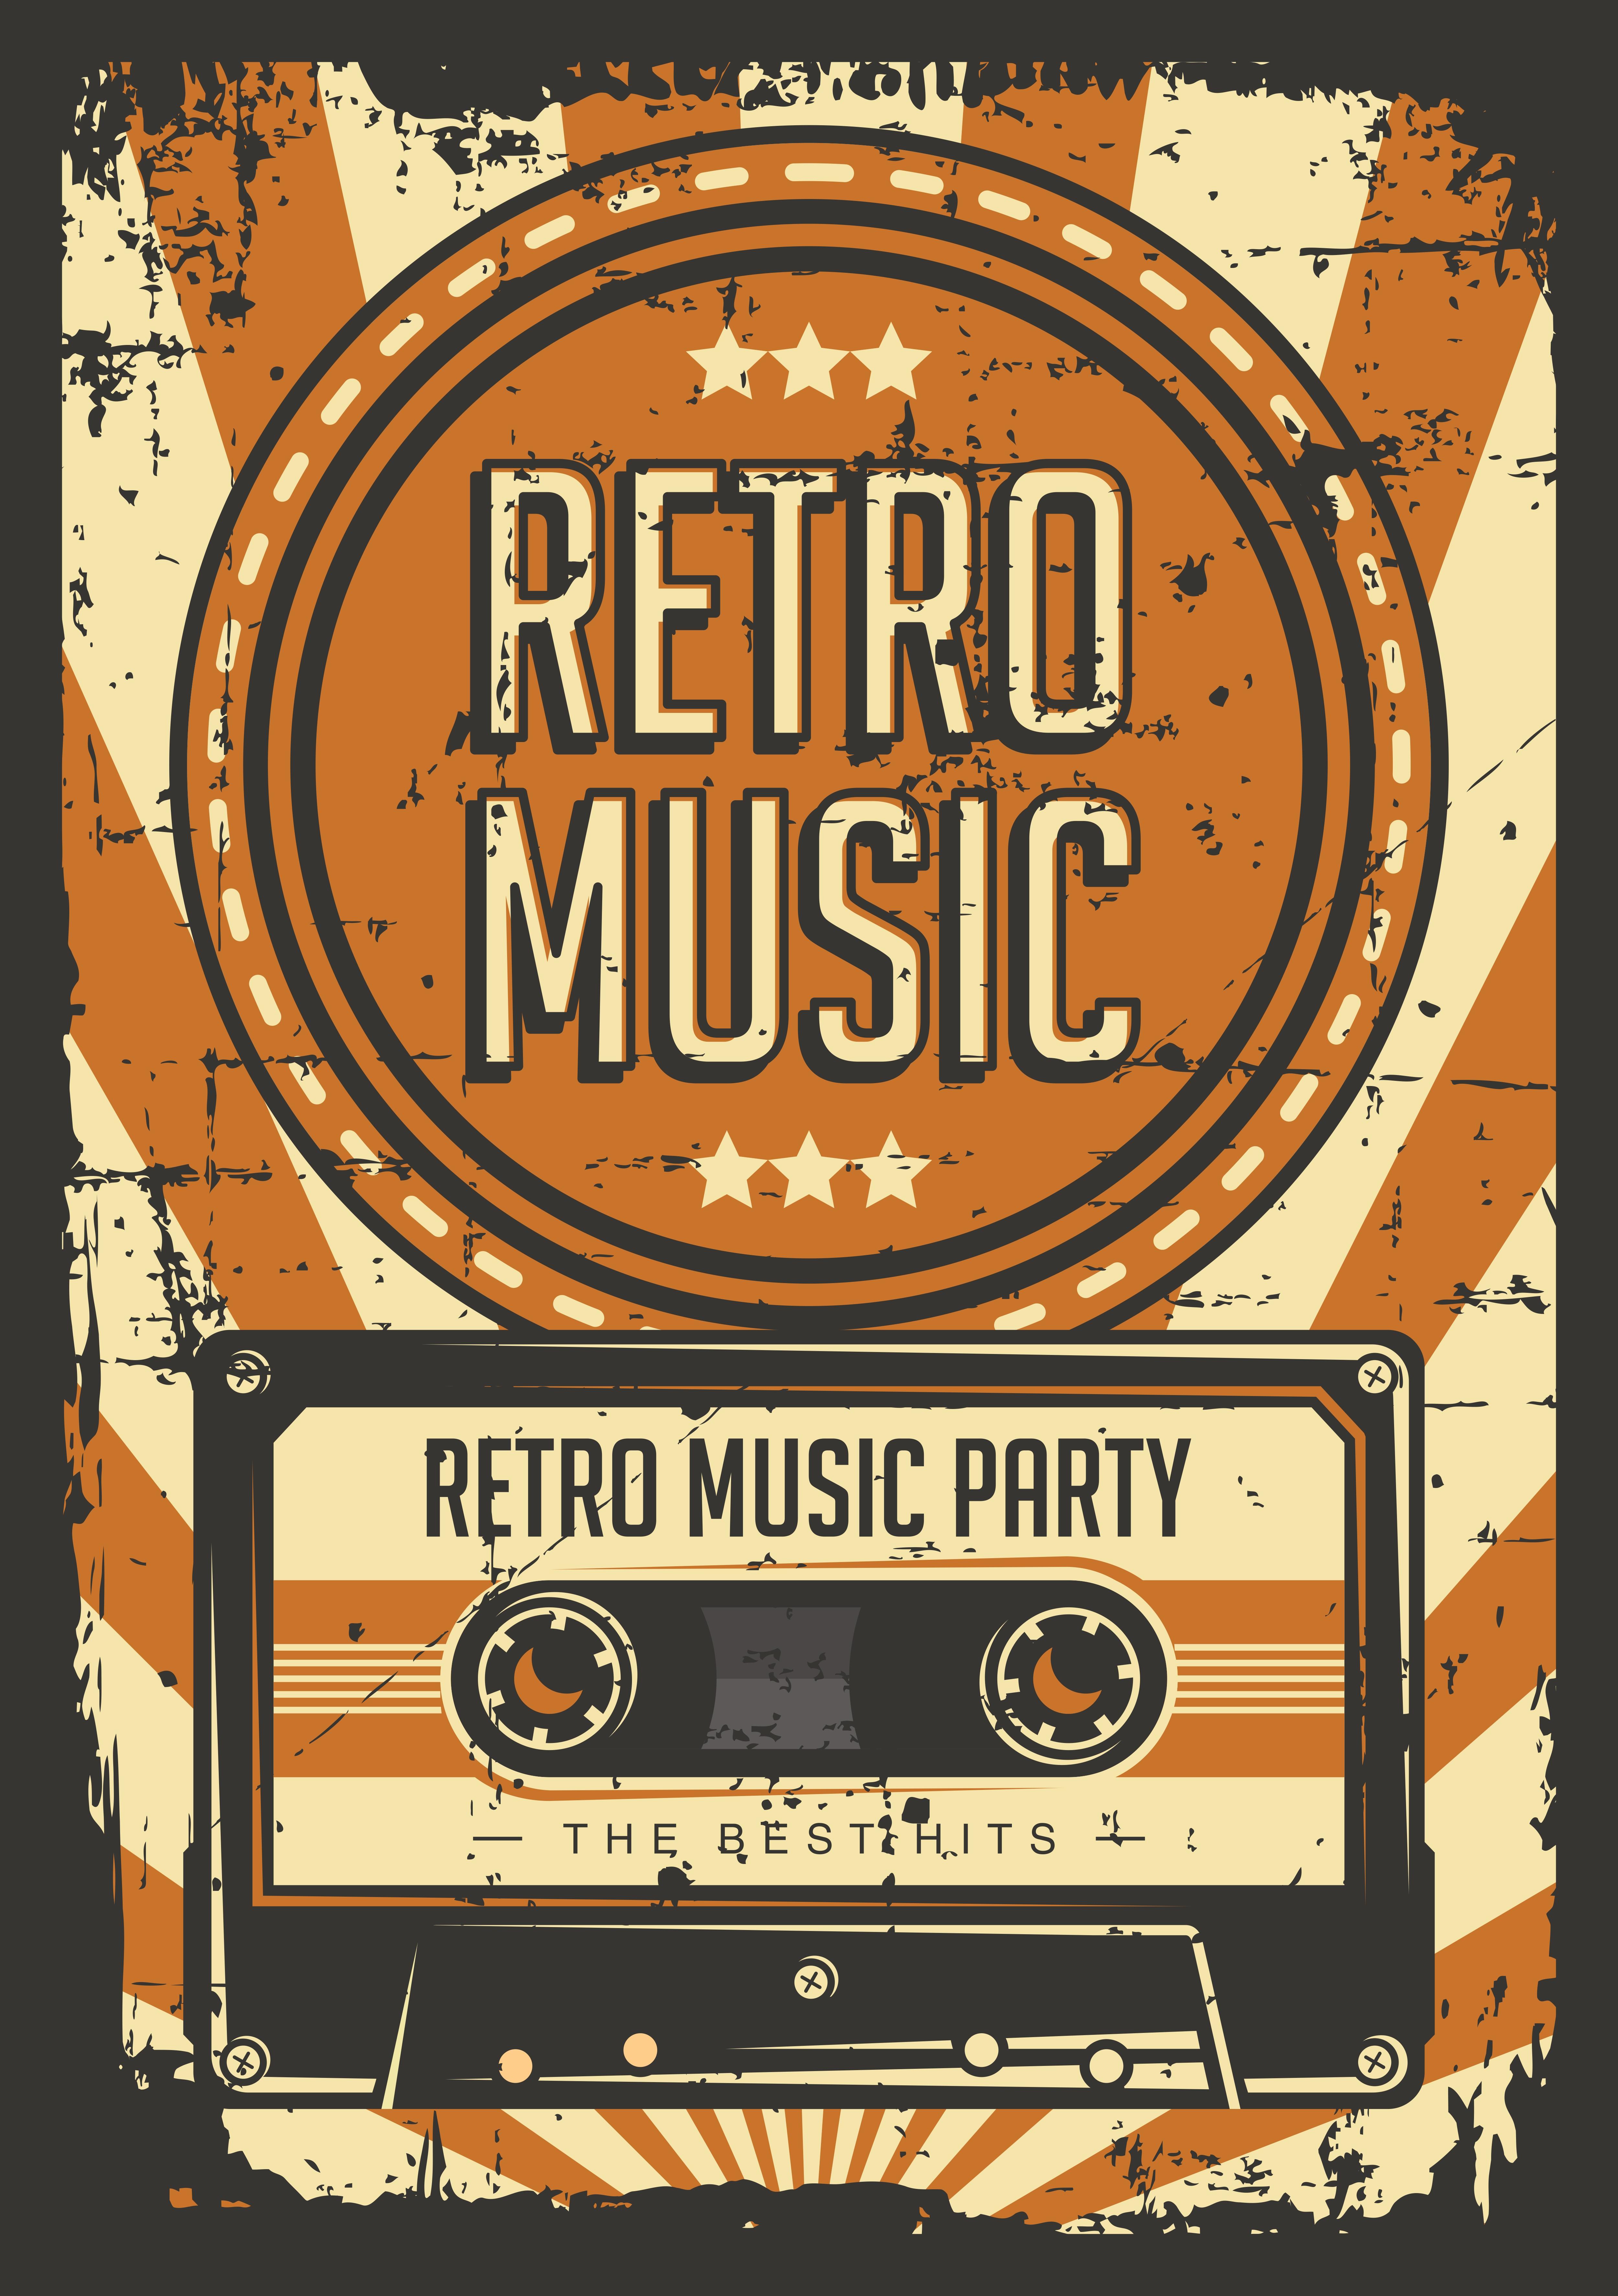 Retro Casette Tape Vintage Poster Download Free Vectors Clipart Graphics Vector Art